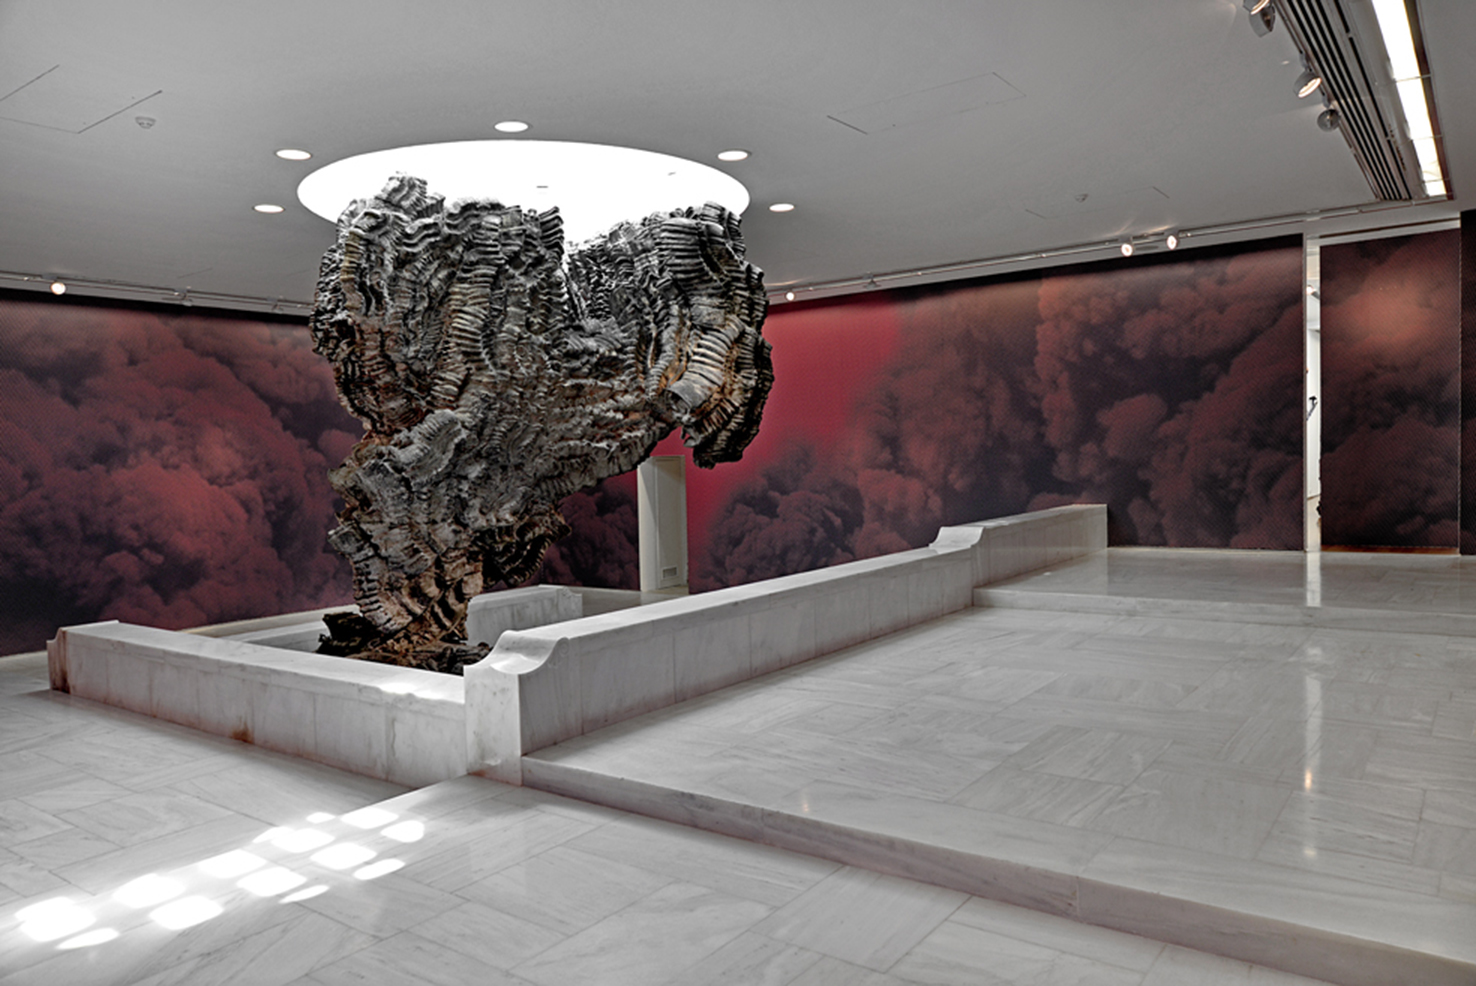 Mise-en-Scène_Red Smoke 2015  Digital print on vinyl Sculpture by Roberto Cuoghi, Belinda, 2013 Photo: Fanis Vlastaras & Rebecca Constantopoulo